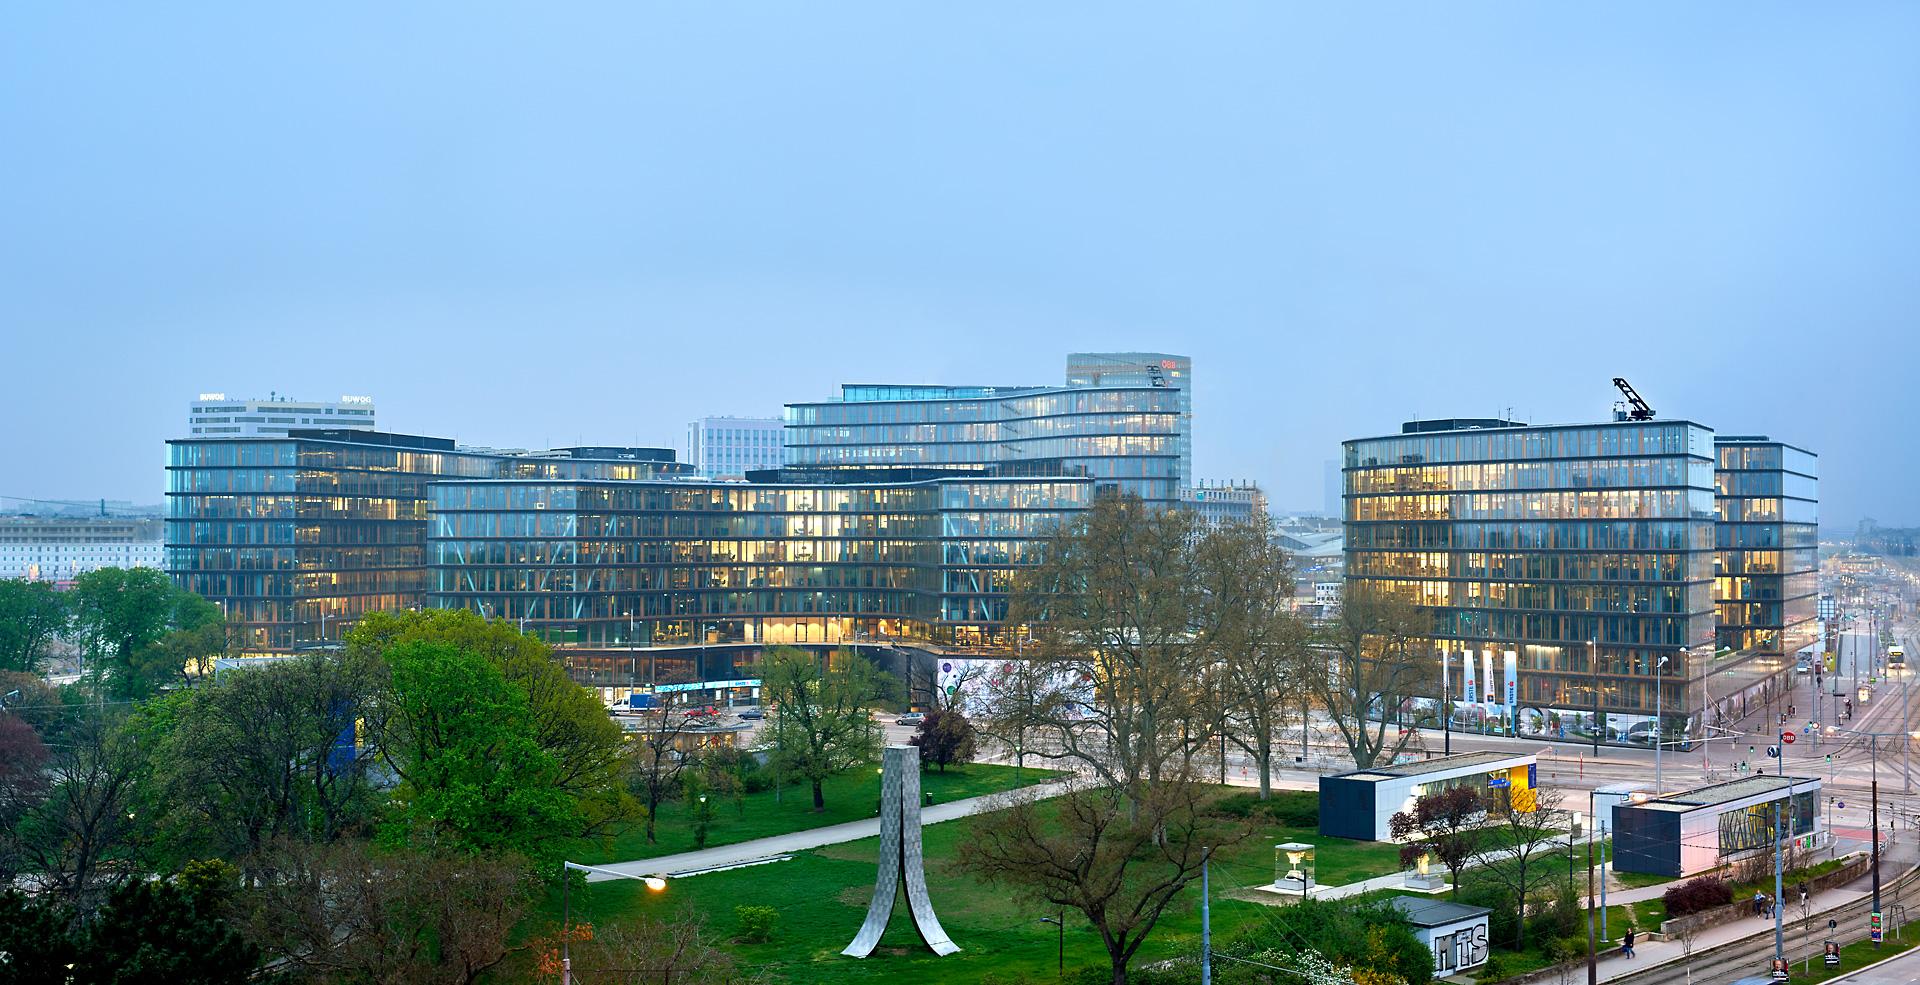 Erste-Campus Foto by Toni Rappersberger